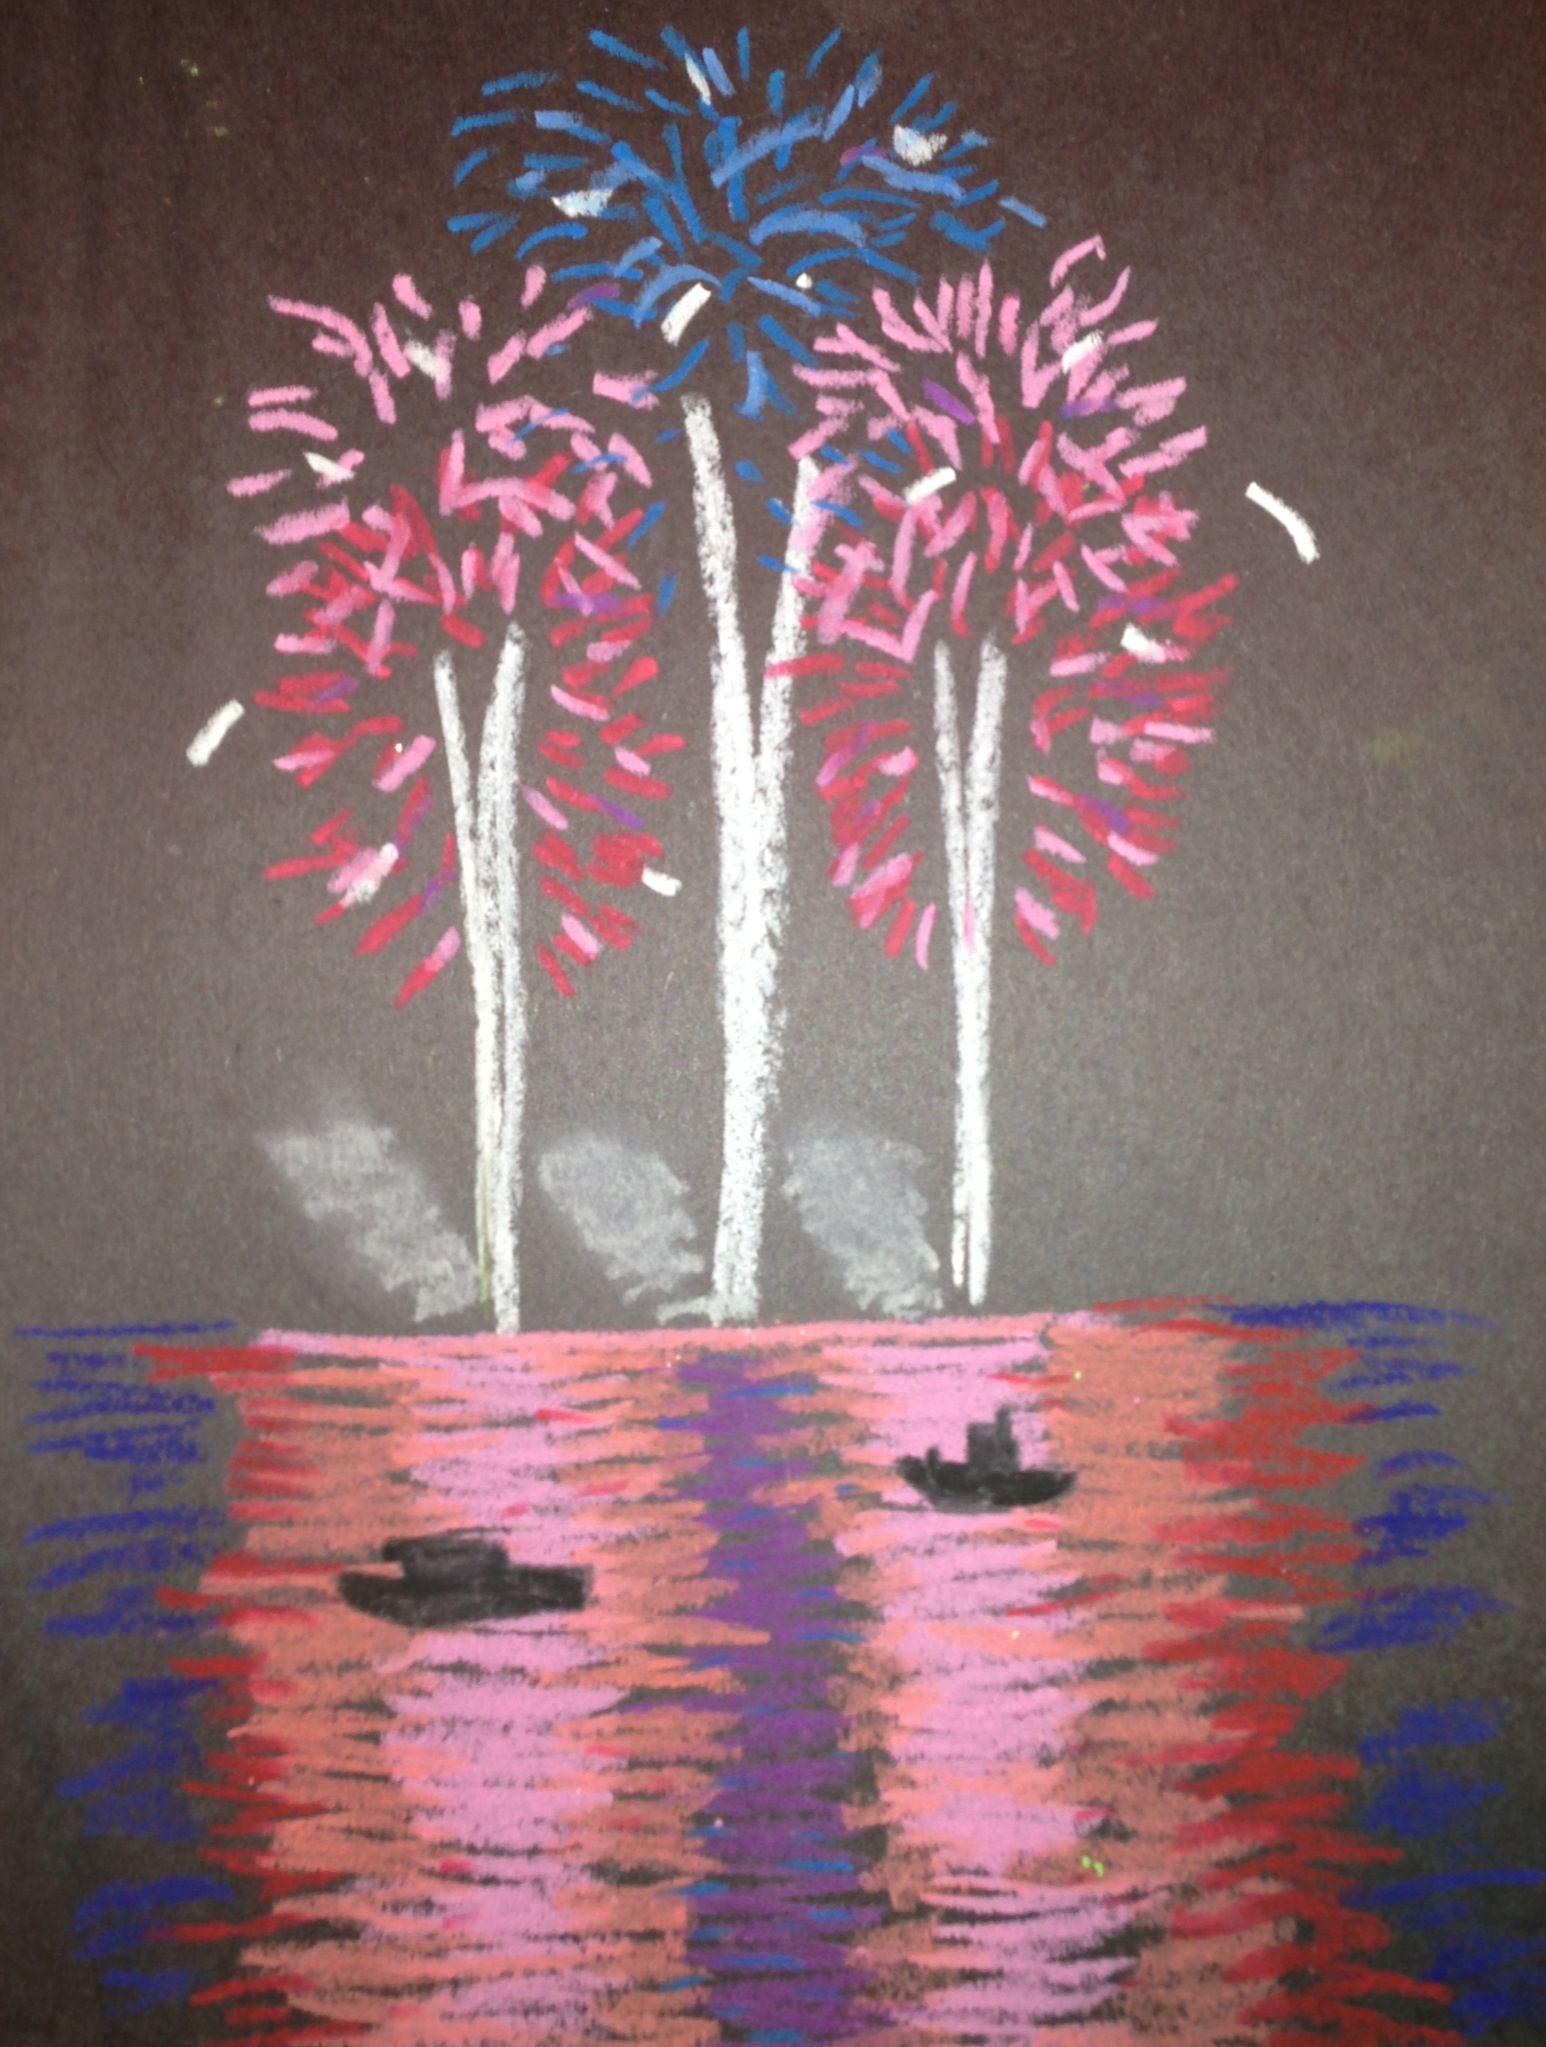 Nighttime fireworks. Oil pastel on black paper. Focused on direction ...